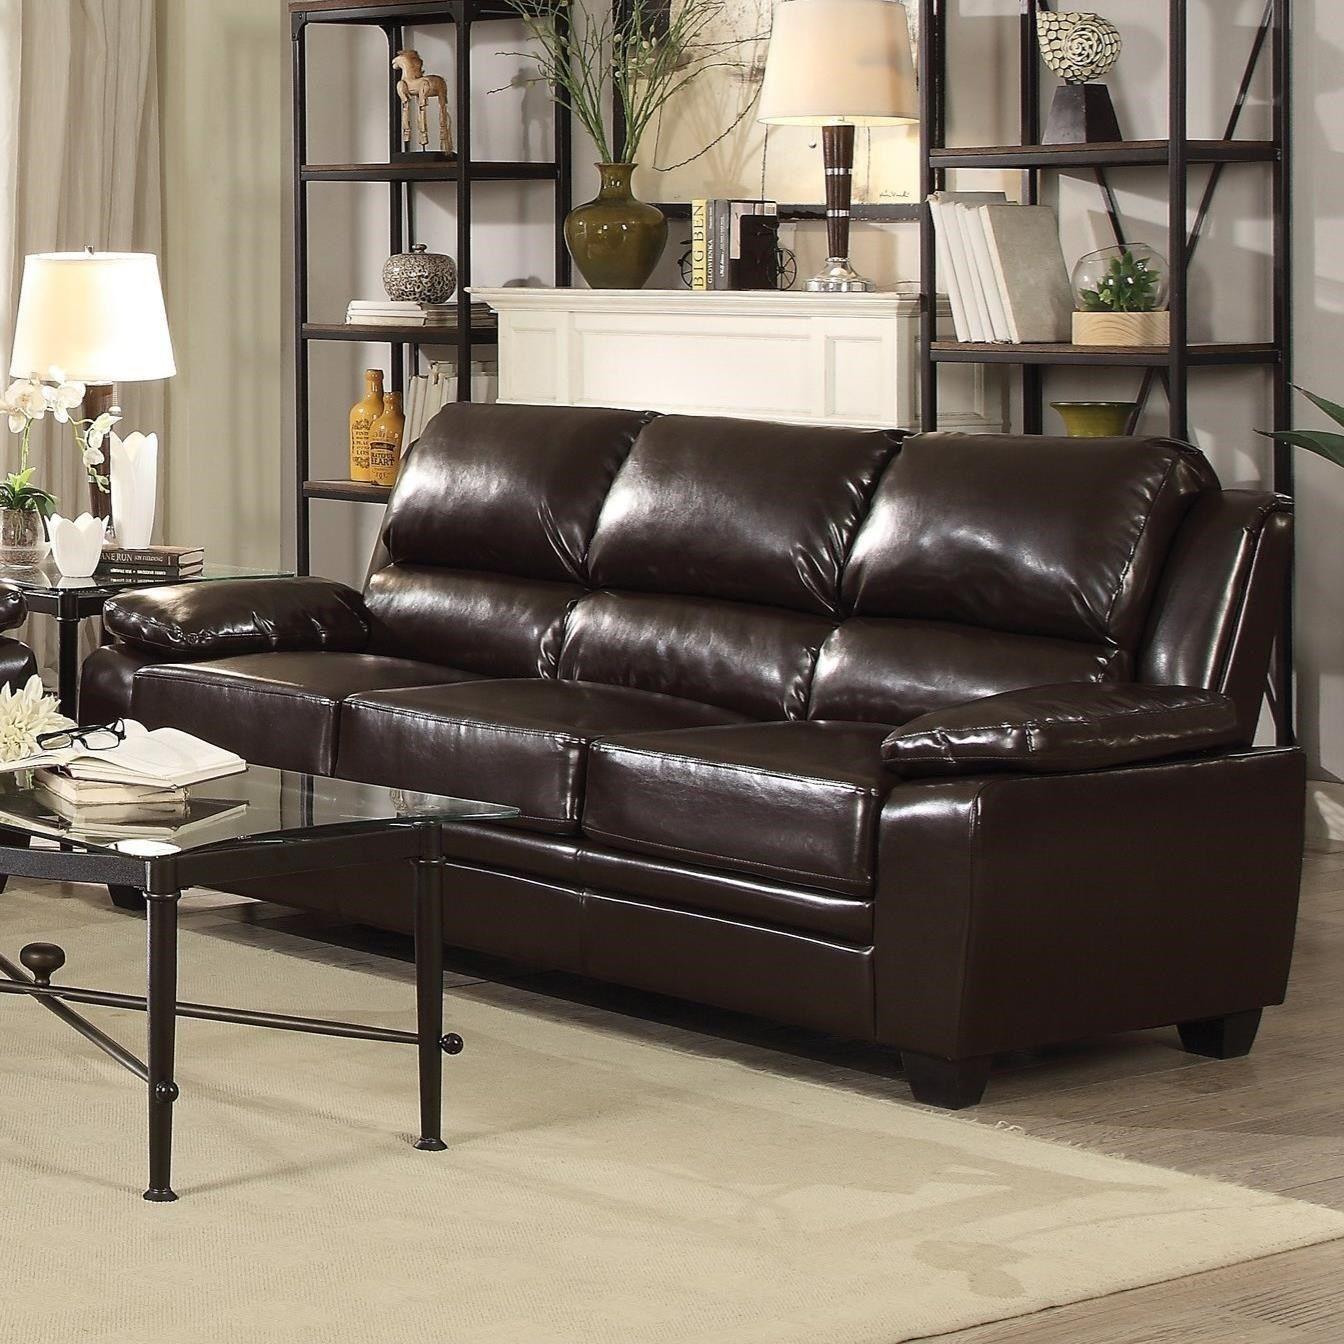 Gryffin Sofa by Coaster Value city furniture, Mattress